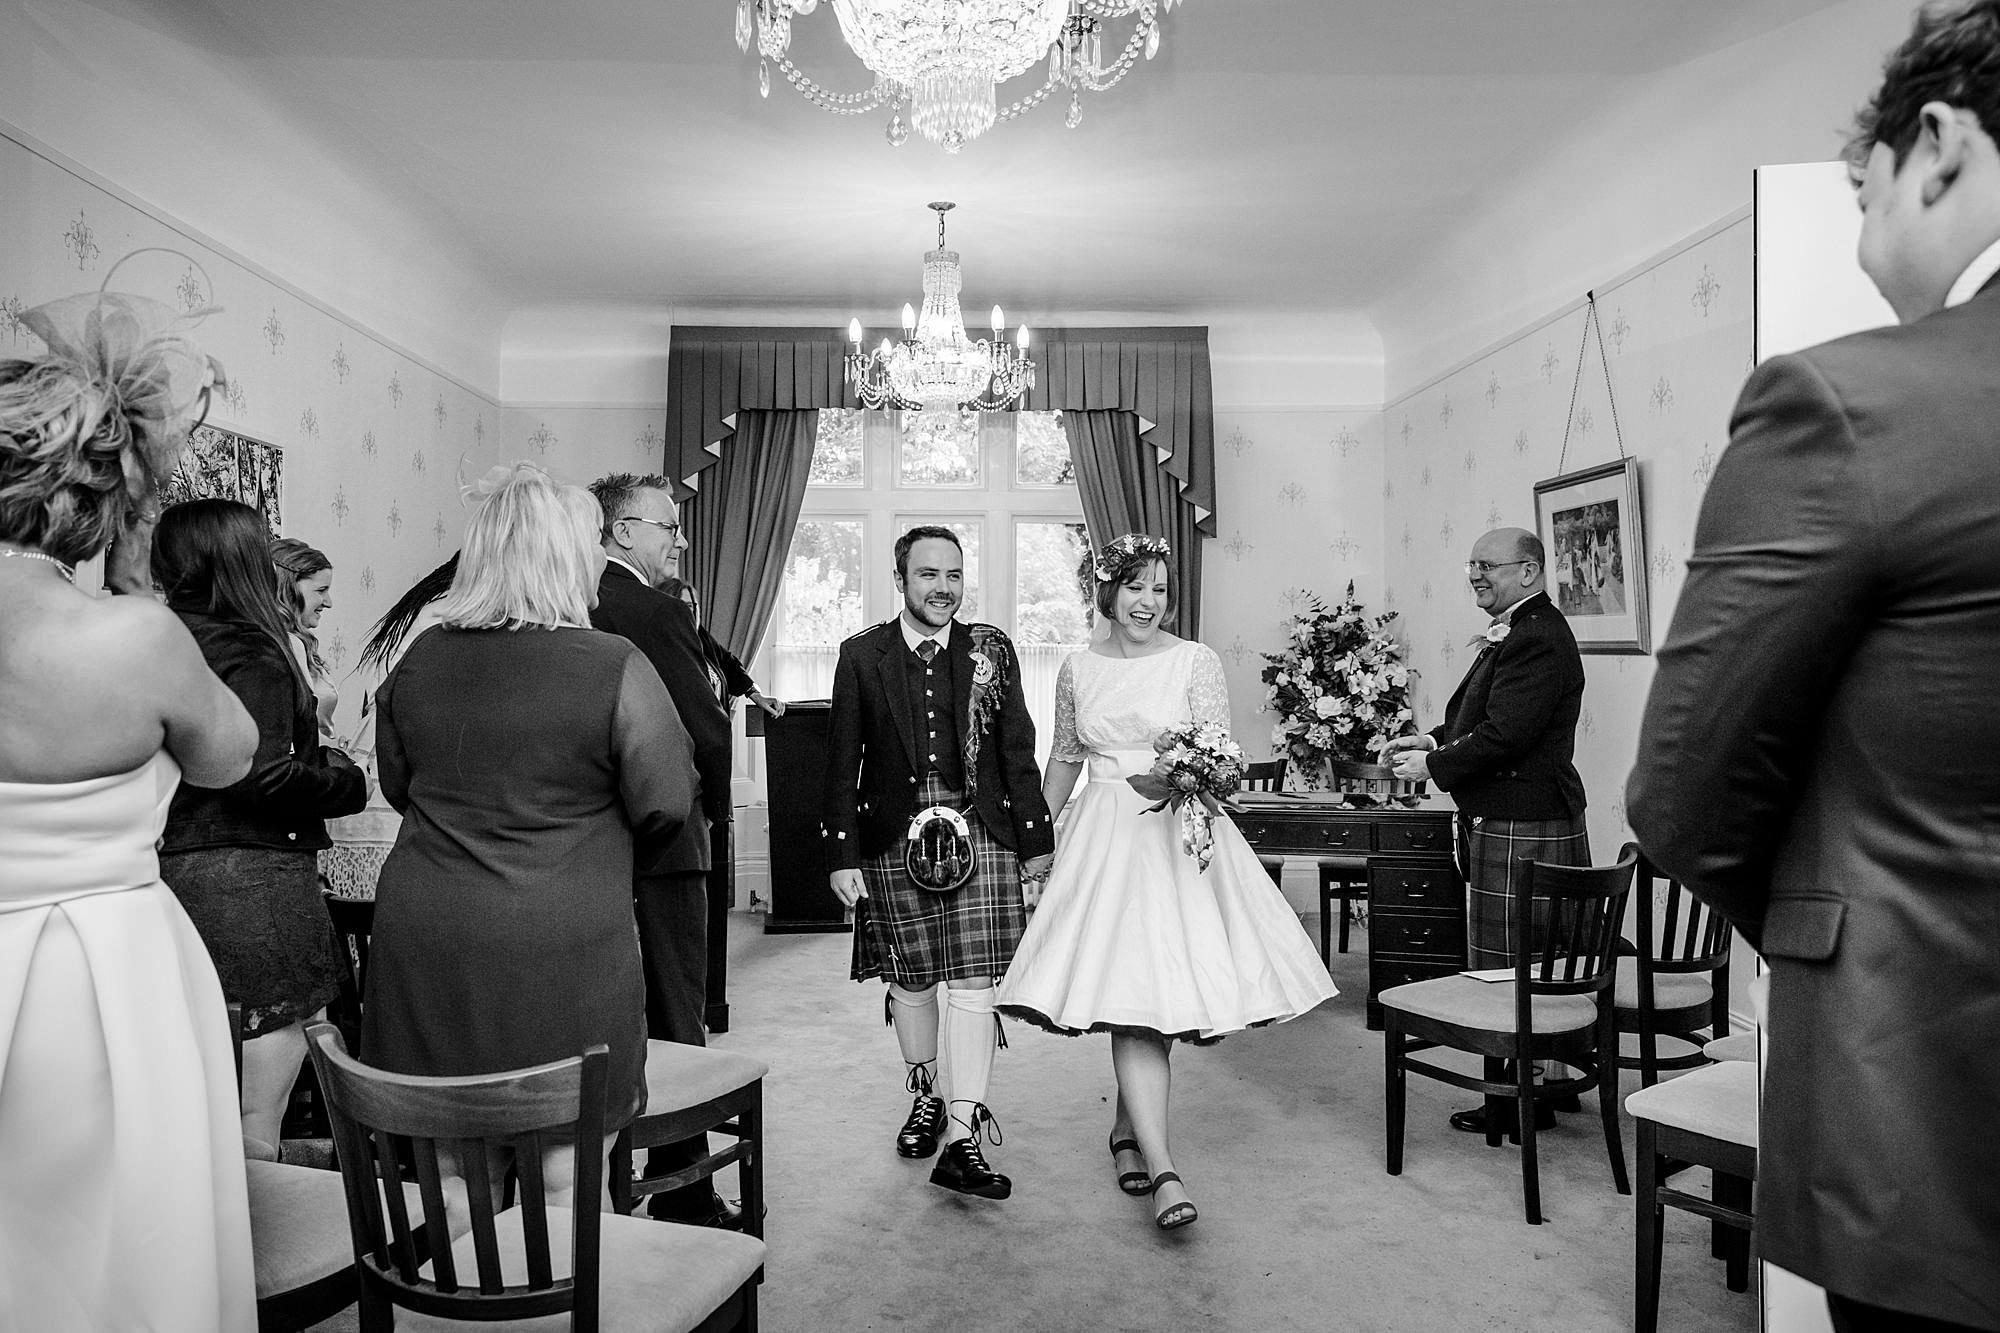 bride and groom walk back down aisle after guildford register office wedding